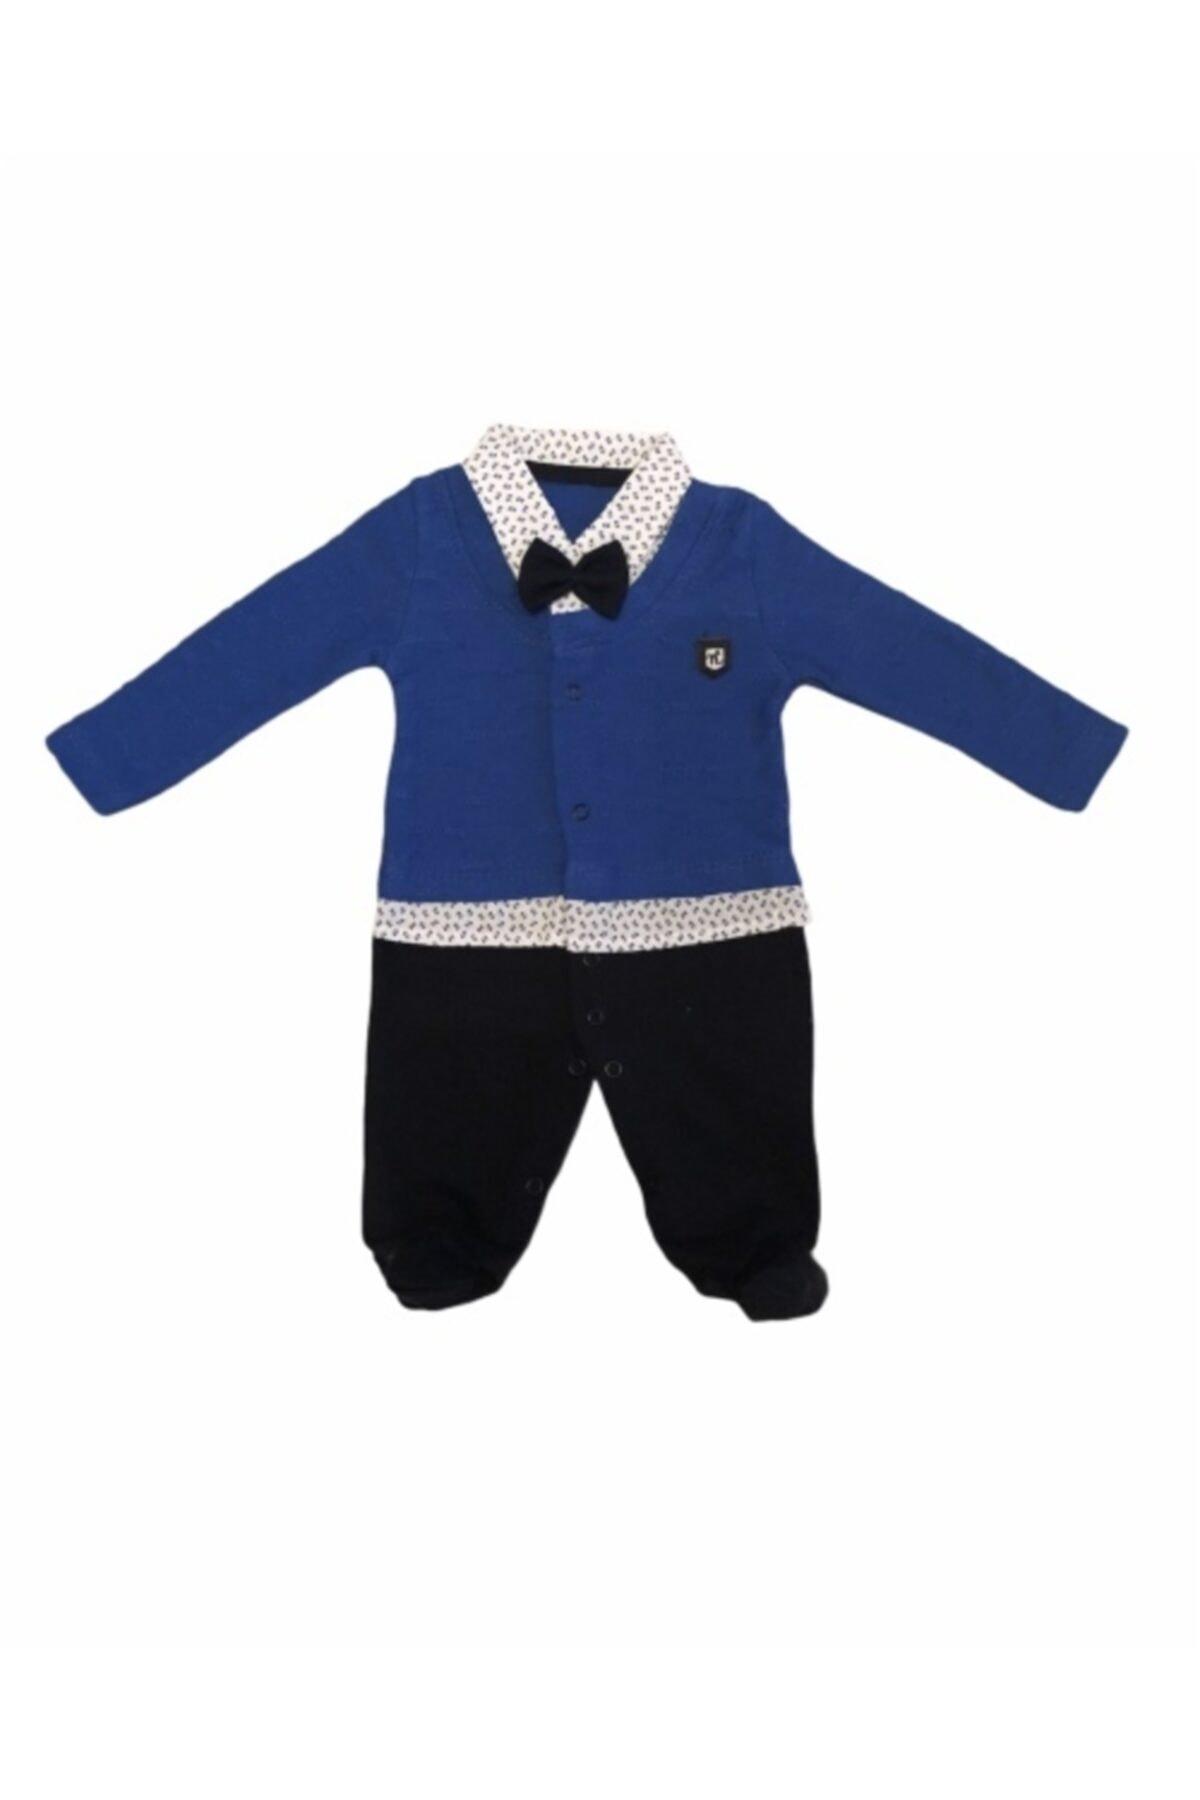 Necix's Erkek Bebek Mavi Papyonlu Patikli Tulum 1